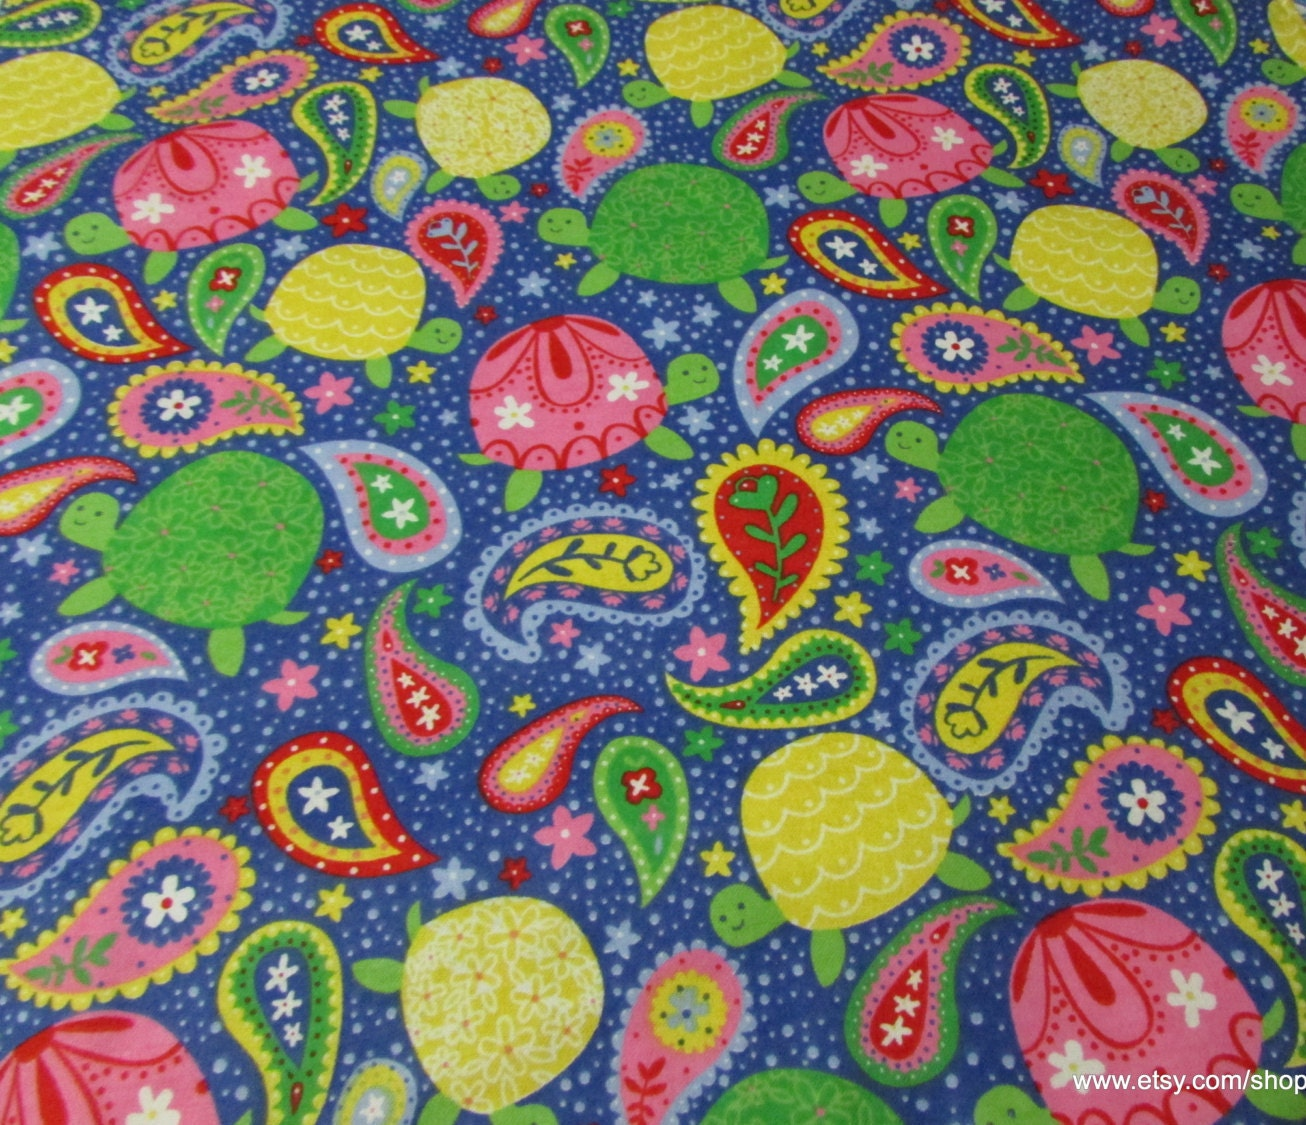 Flannel Fabric Paisley Turtles 1 Yard 100 Cotton